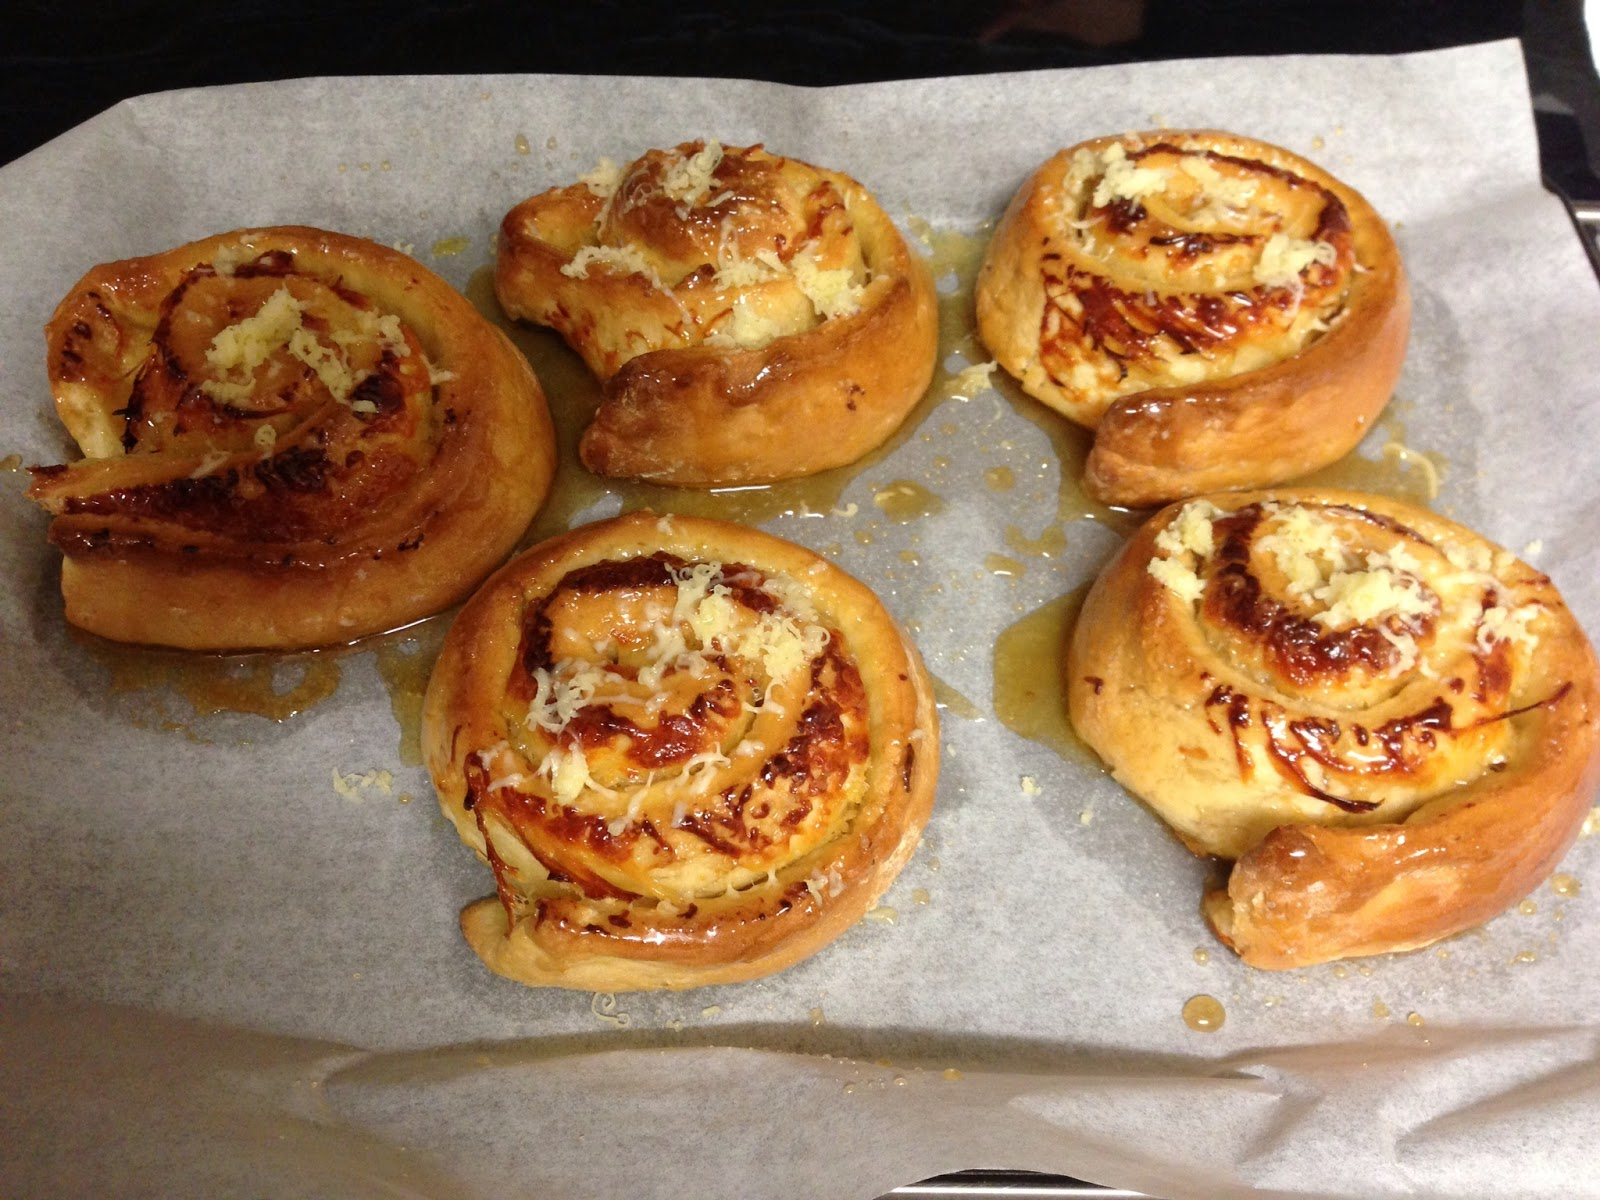 Luisana's kitchen: Venezuelan sticky buns (Golfeados)